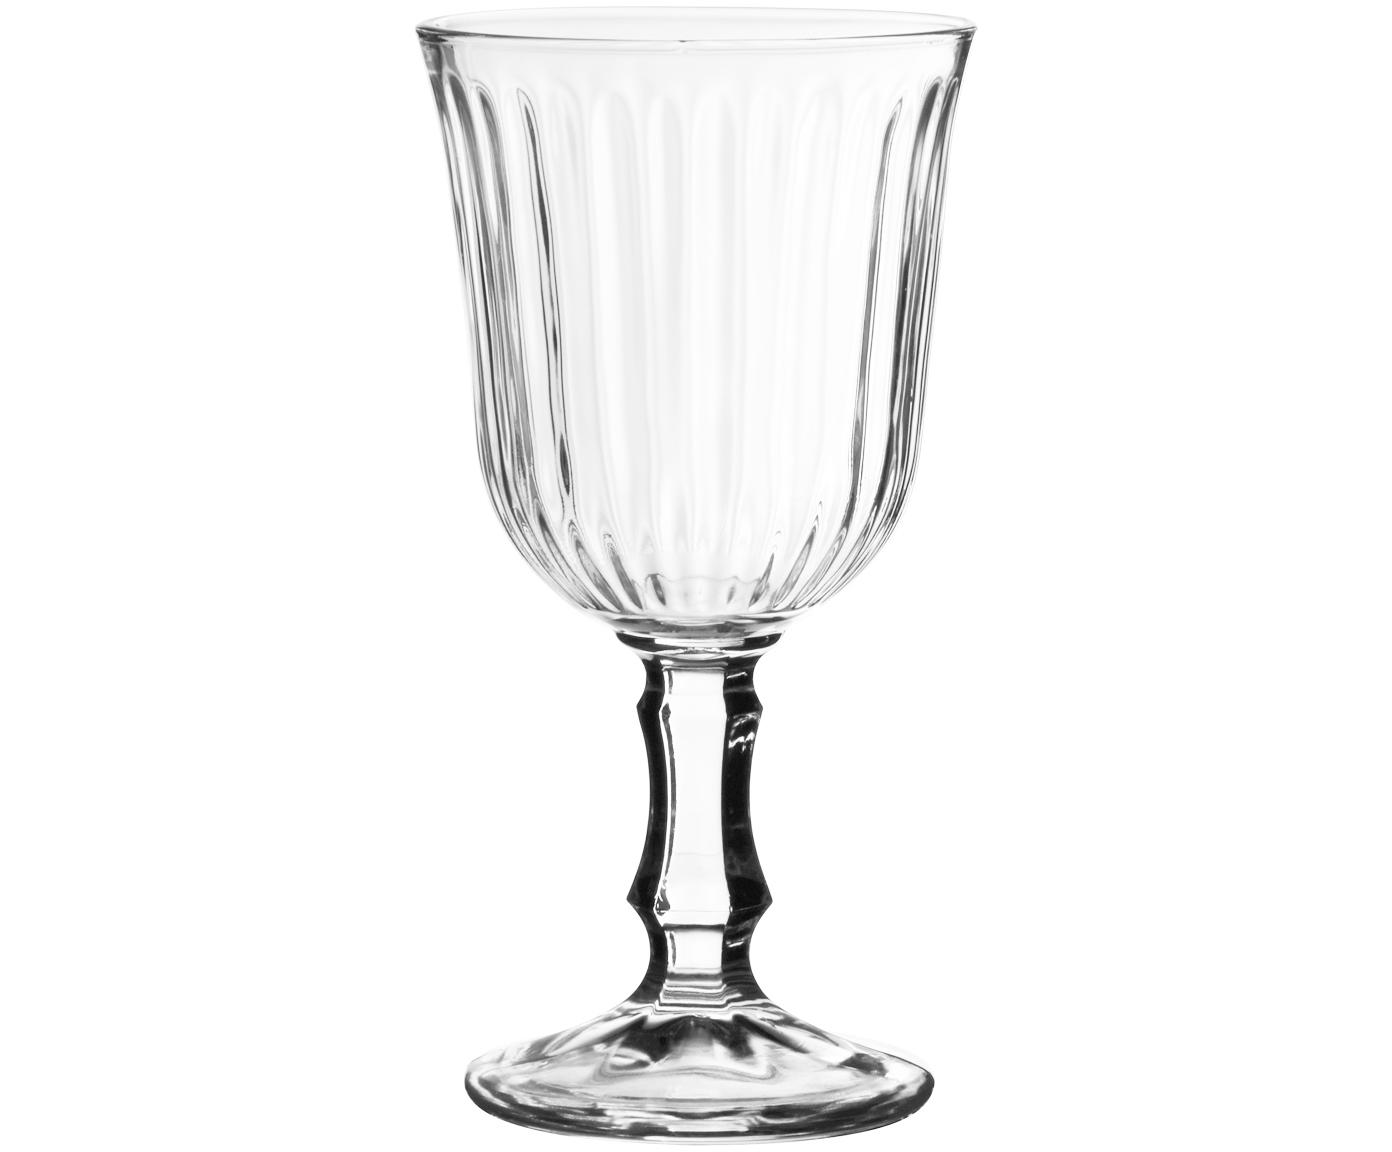 Bicchiere da vino Belem 12 pz, Vetro, Trasparente, 180 ml